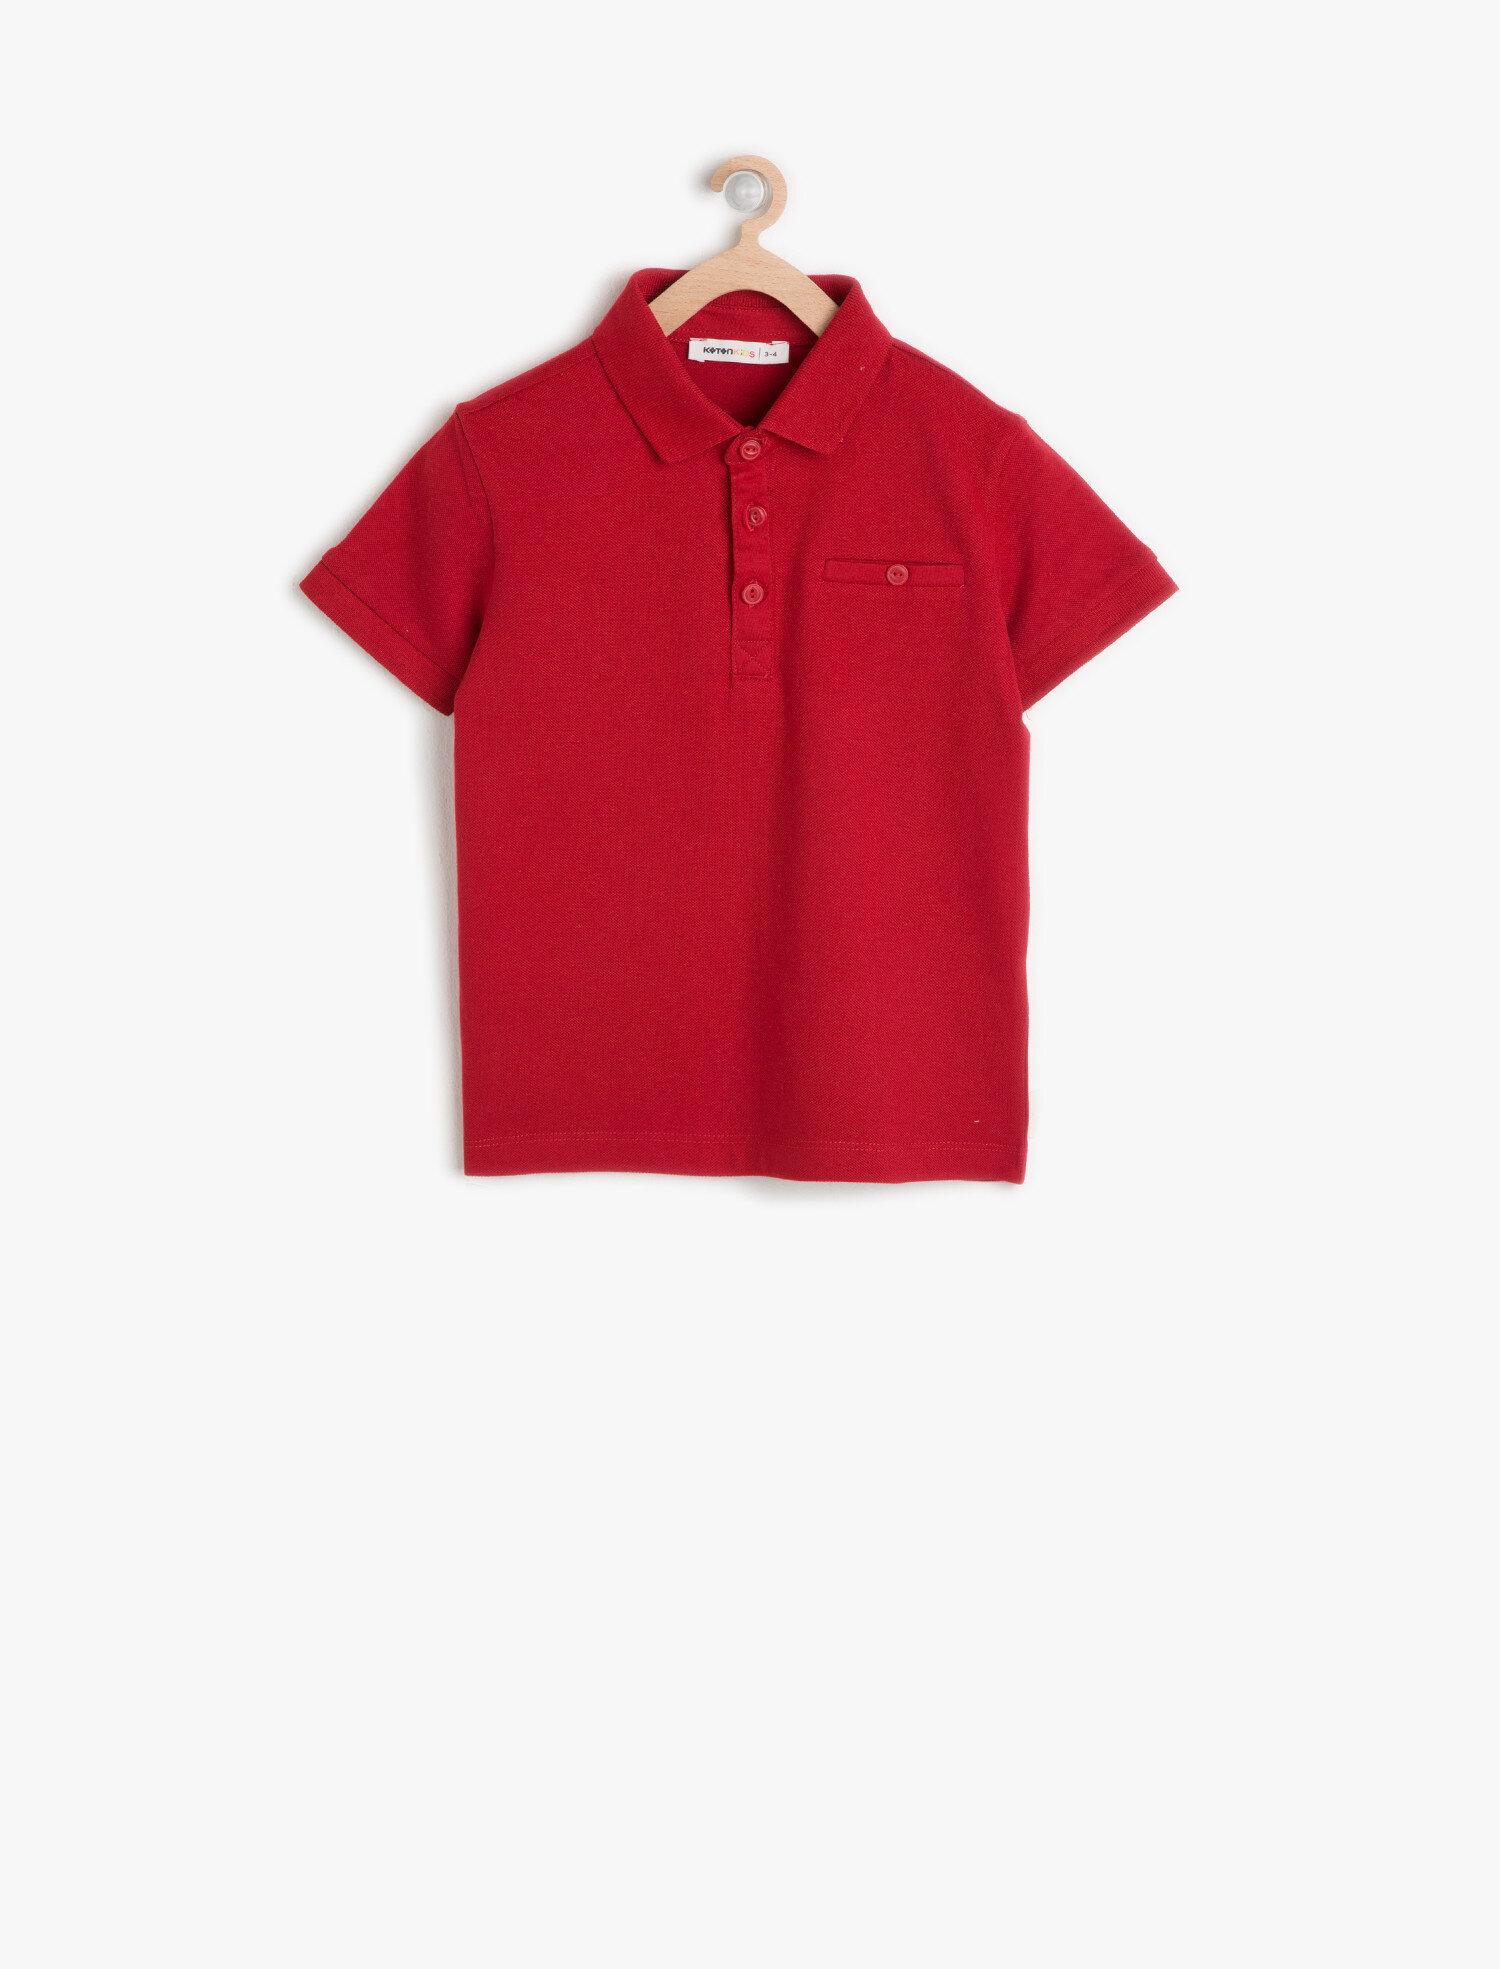 63a0000a0 Plain Red T Shirt Baby - DREAMWORKS